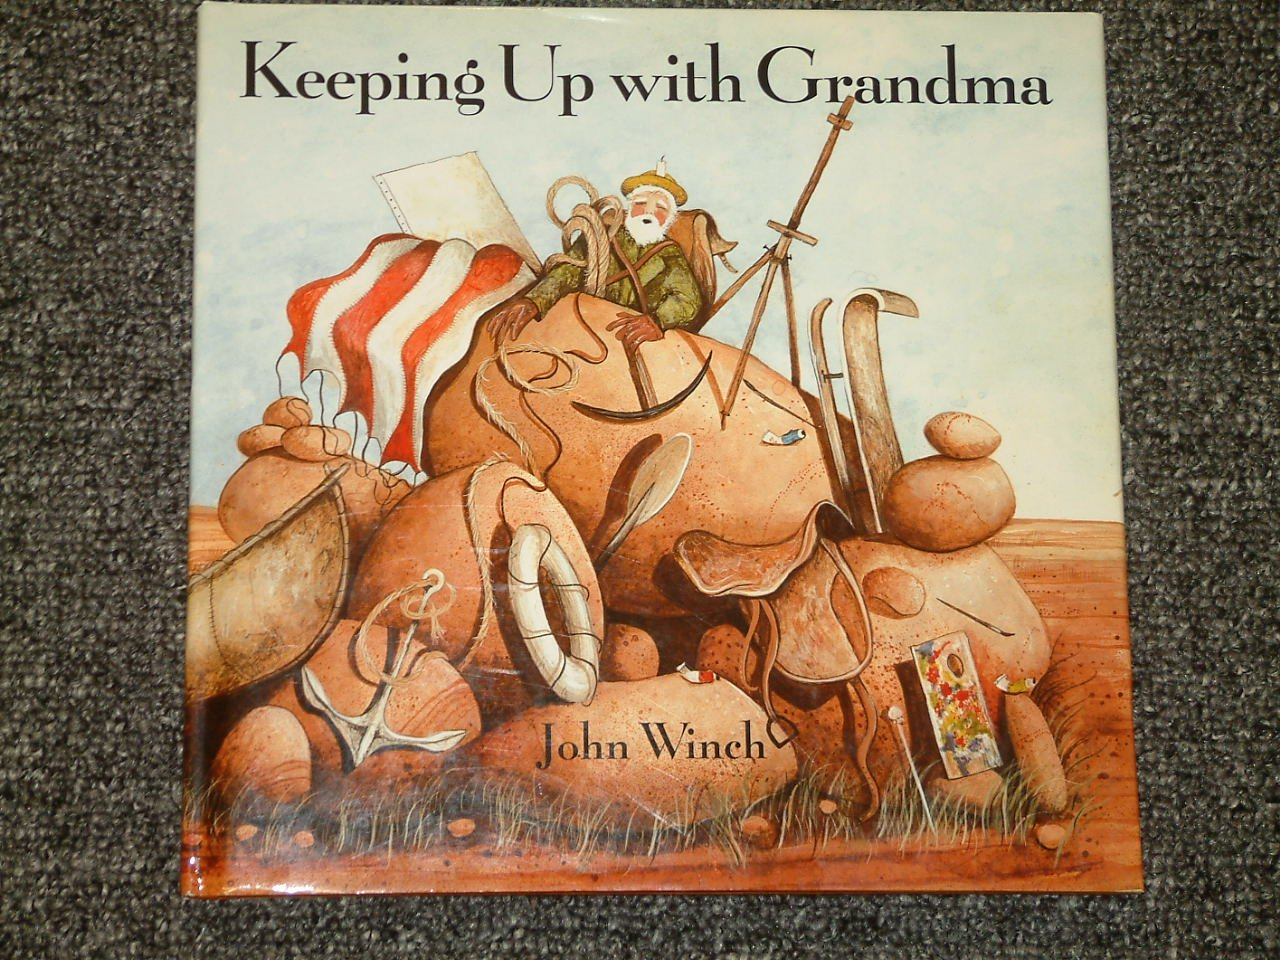 Keeping Up with Grandma by John Winch HB DJ